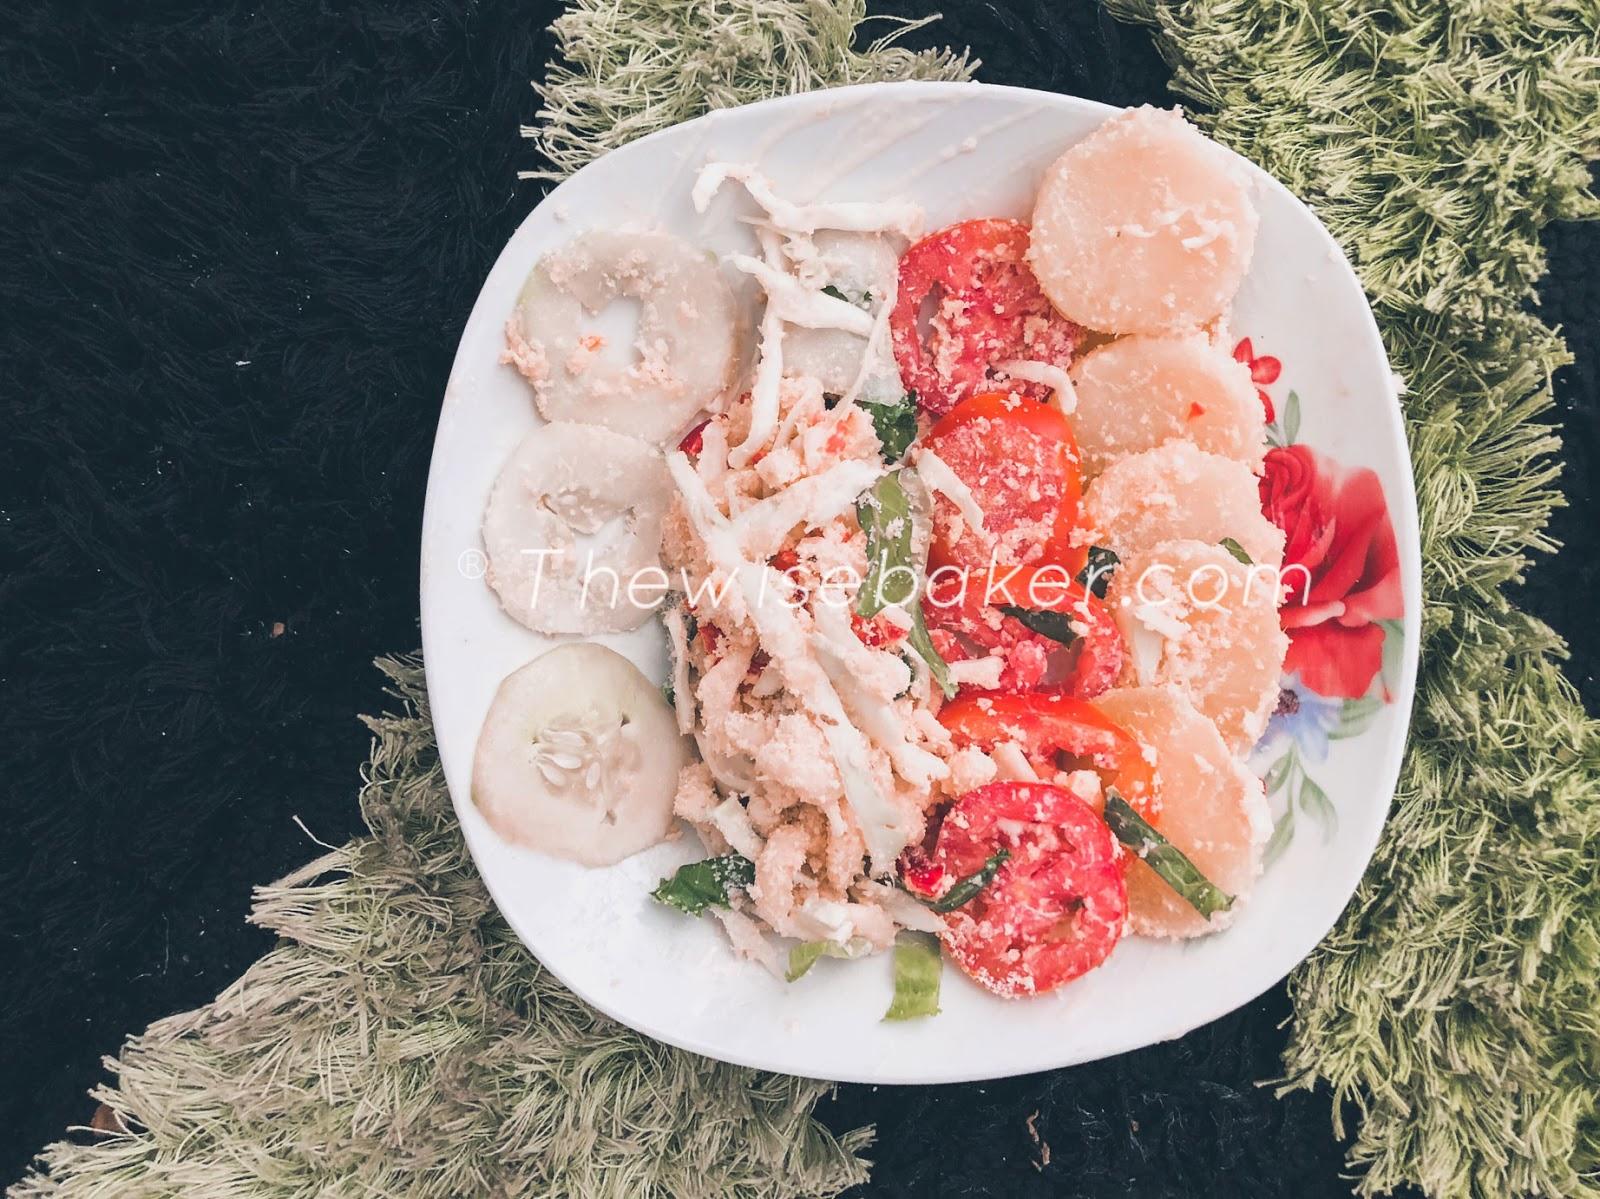 Garri salad or sauce